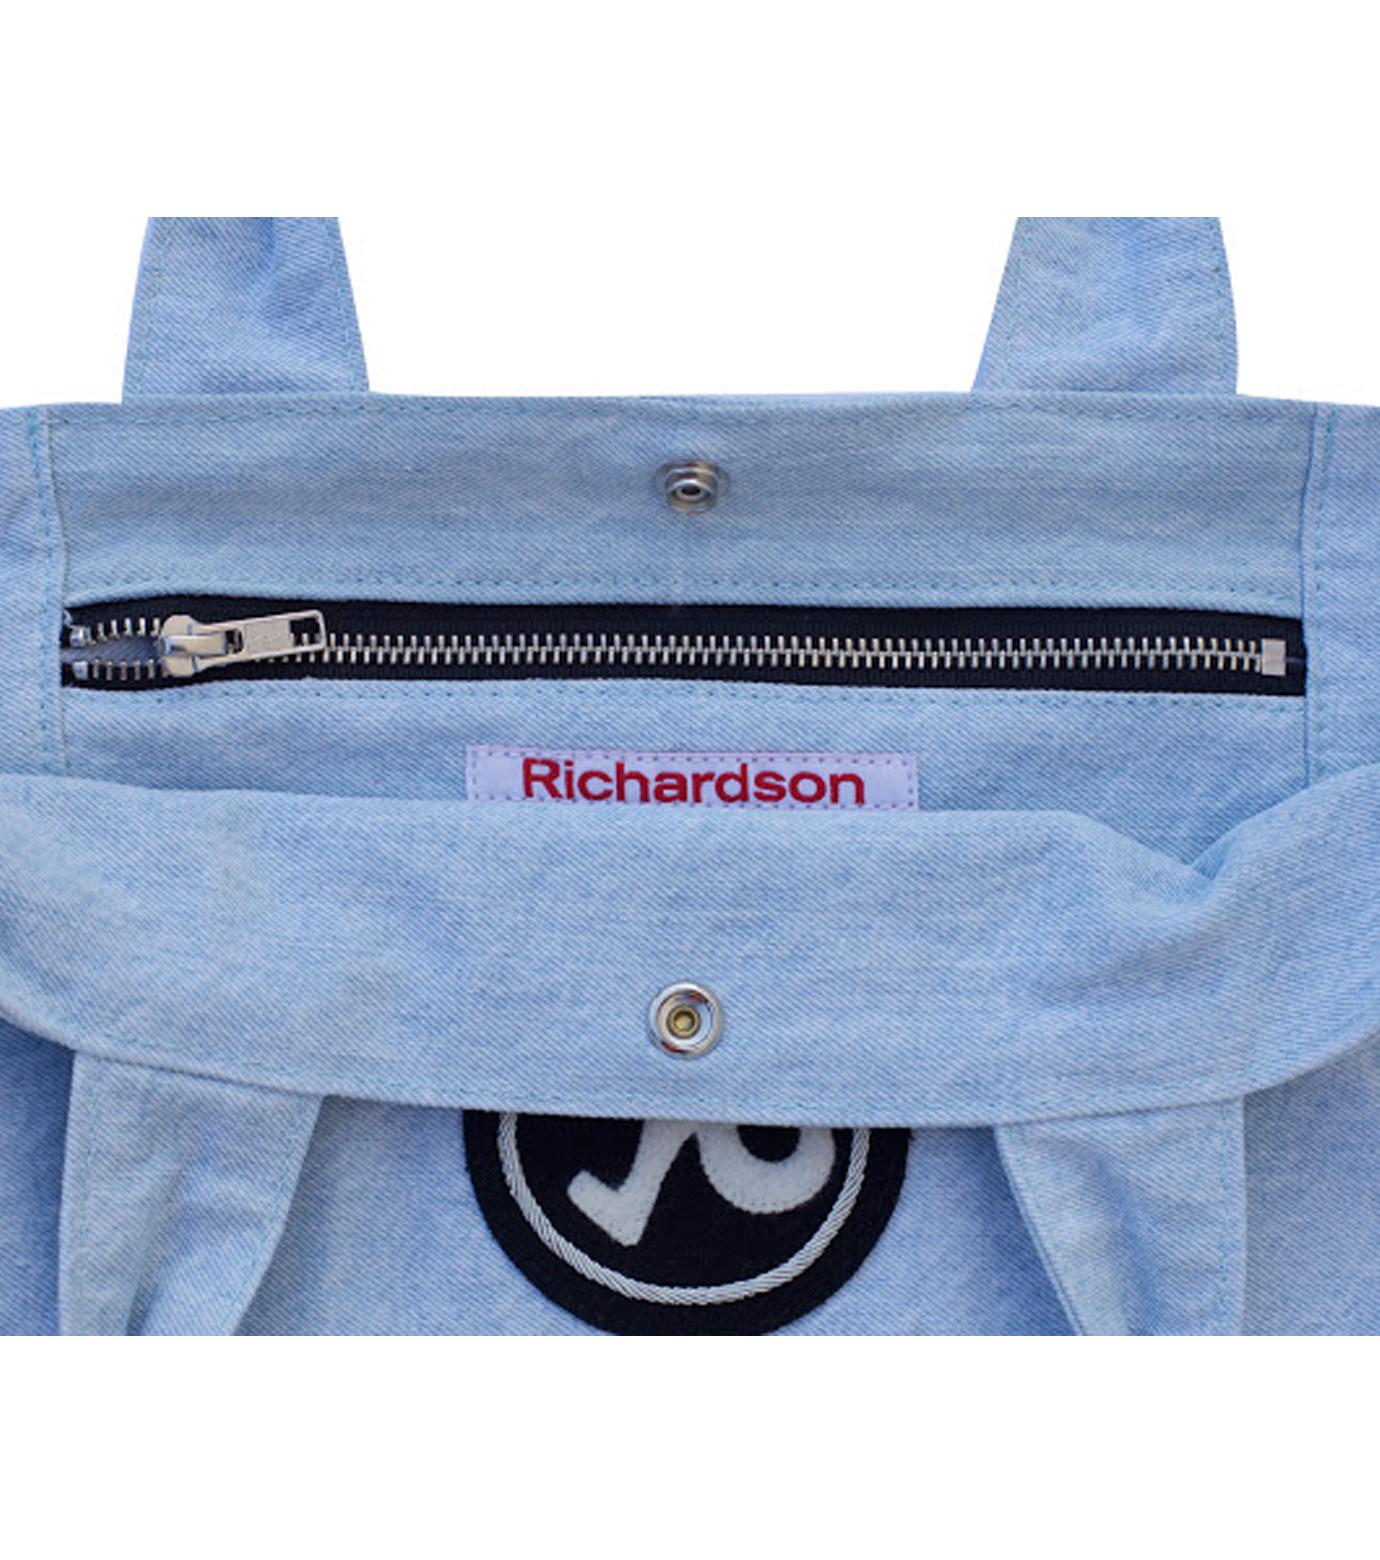 Richardson Magazine(リチャードソン マガジン)のDenim Tote-BLUE(ハンドバッグ/hand bag)-AW16011-92 拡大詳細画像3